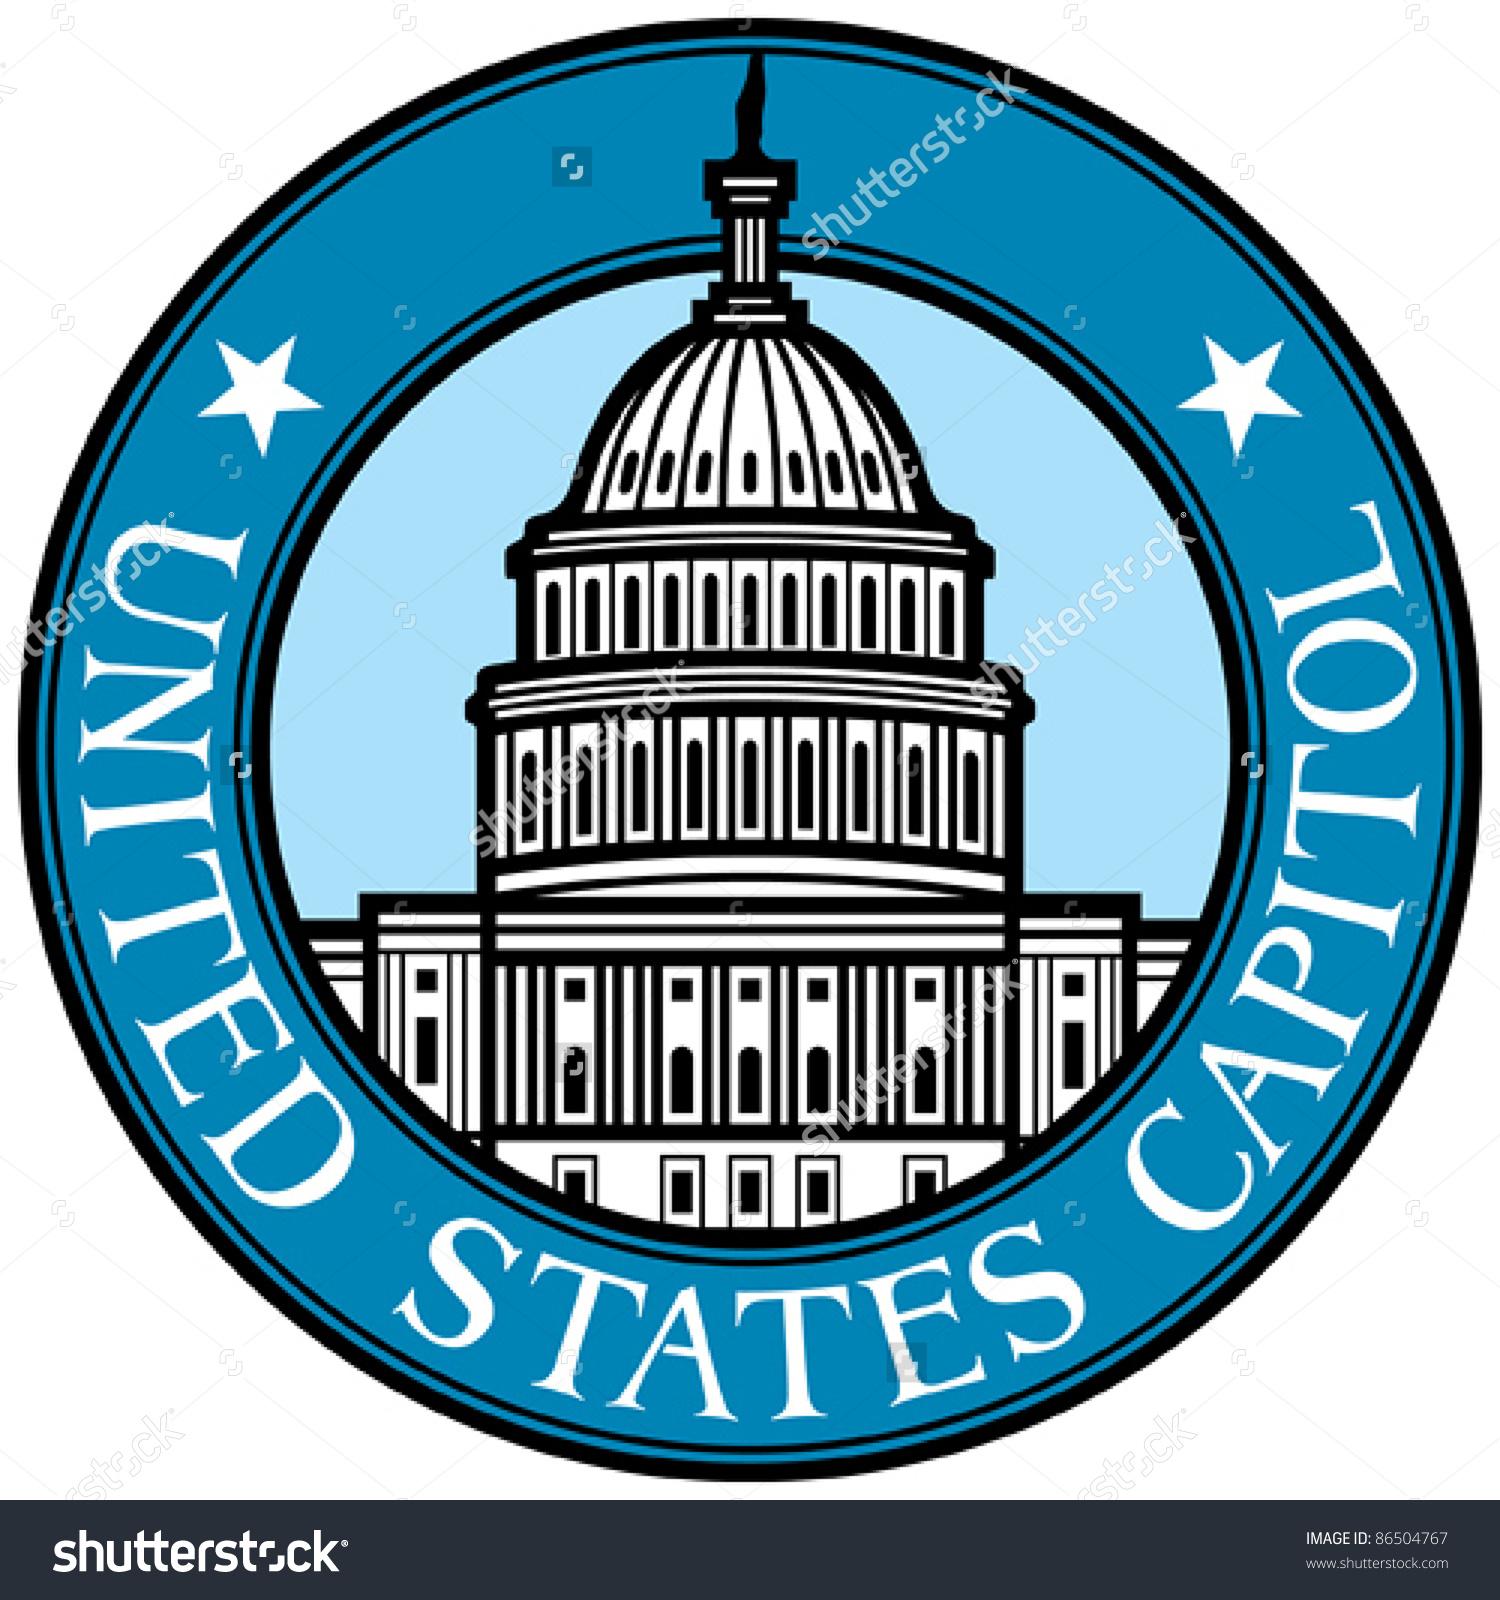 Us capitol clip art vector United States Capitol Stock Vector 86504767 - Shutterstock vector